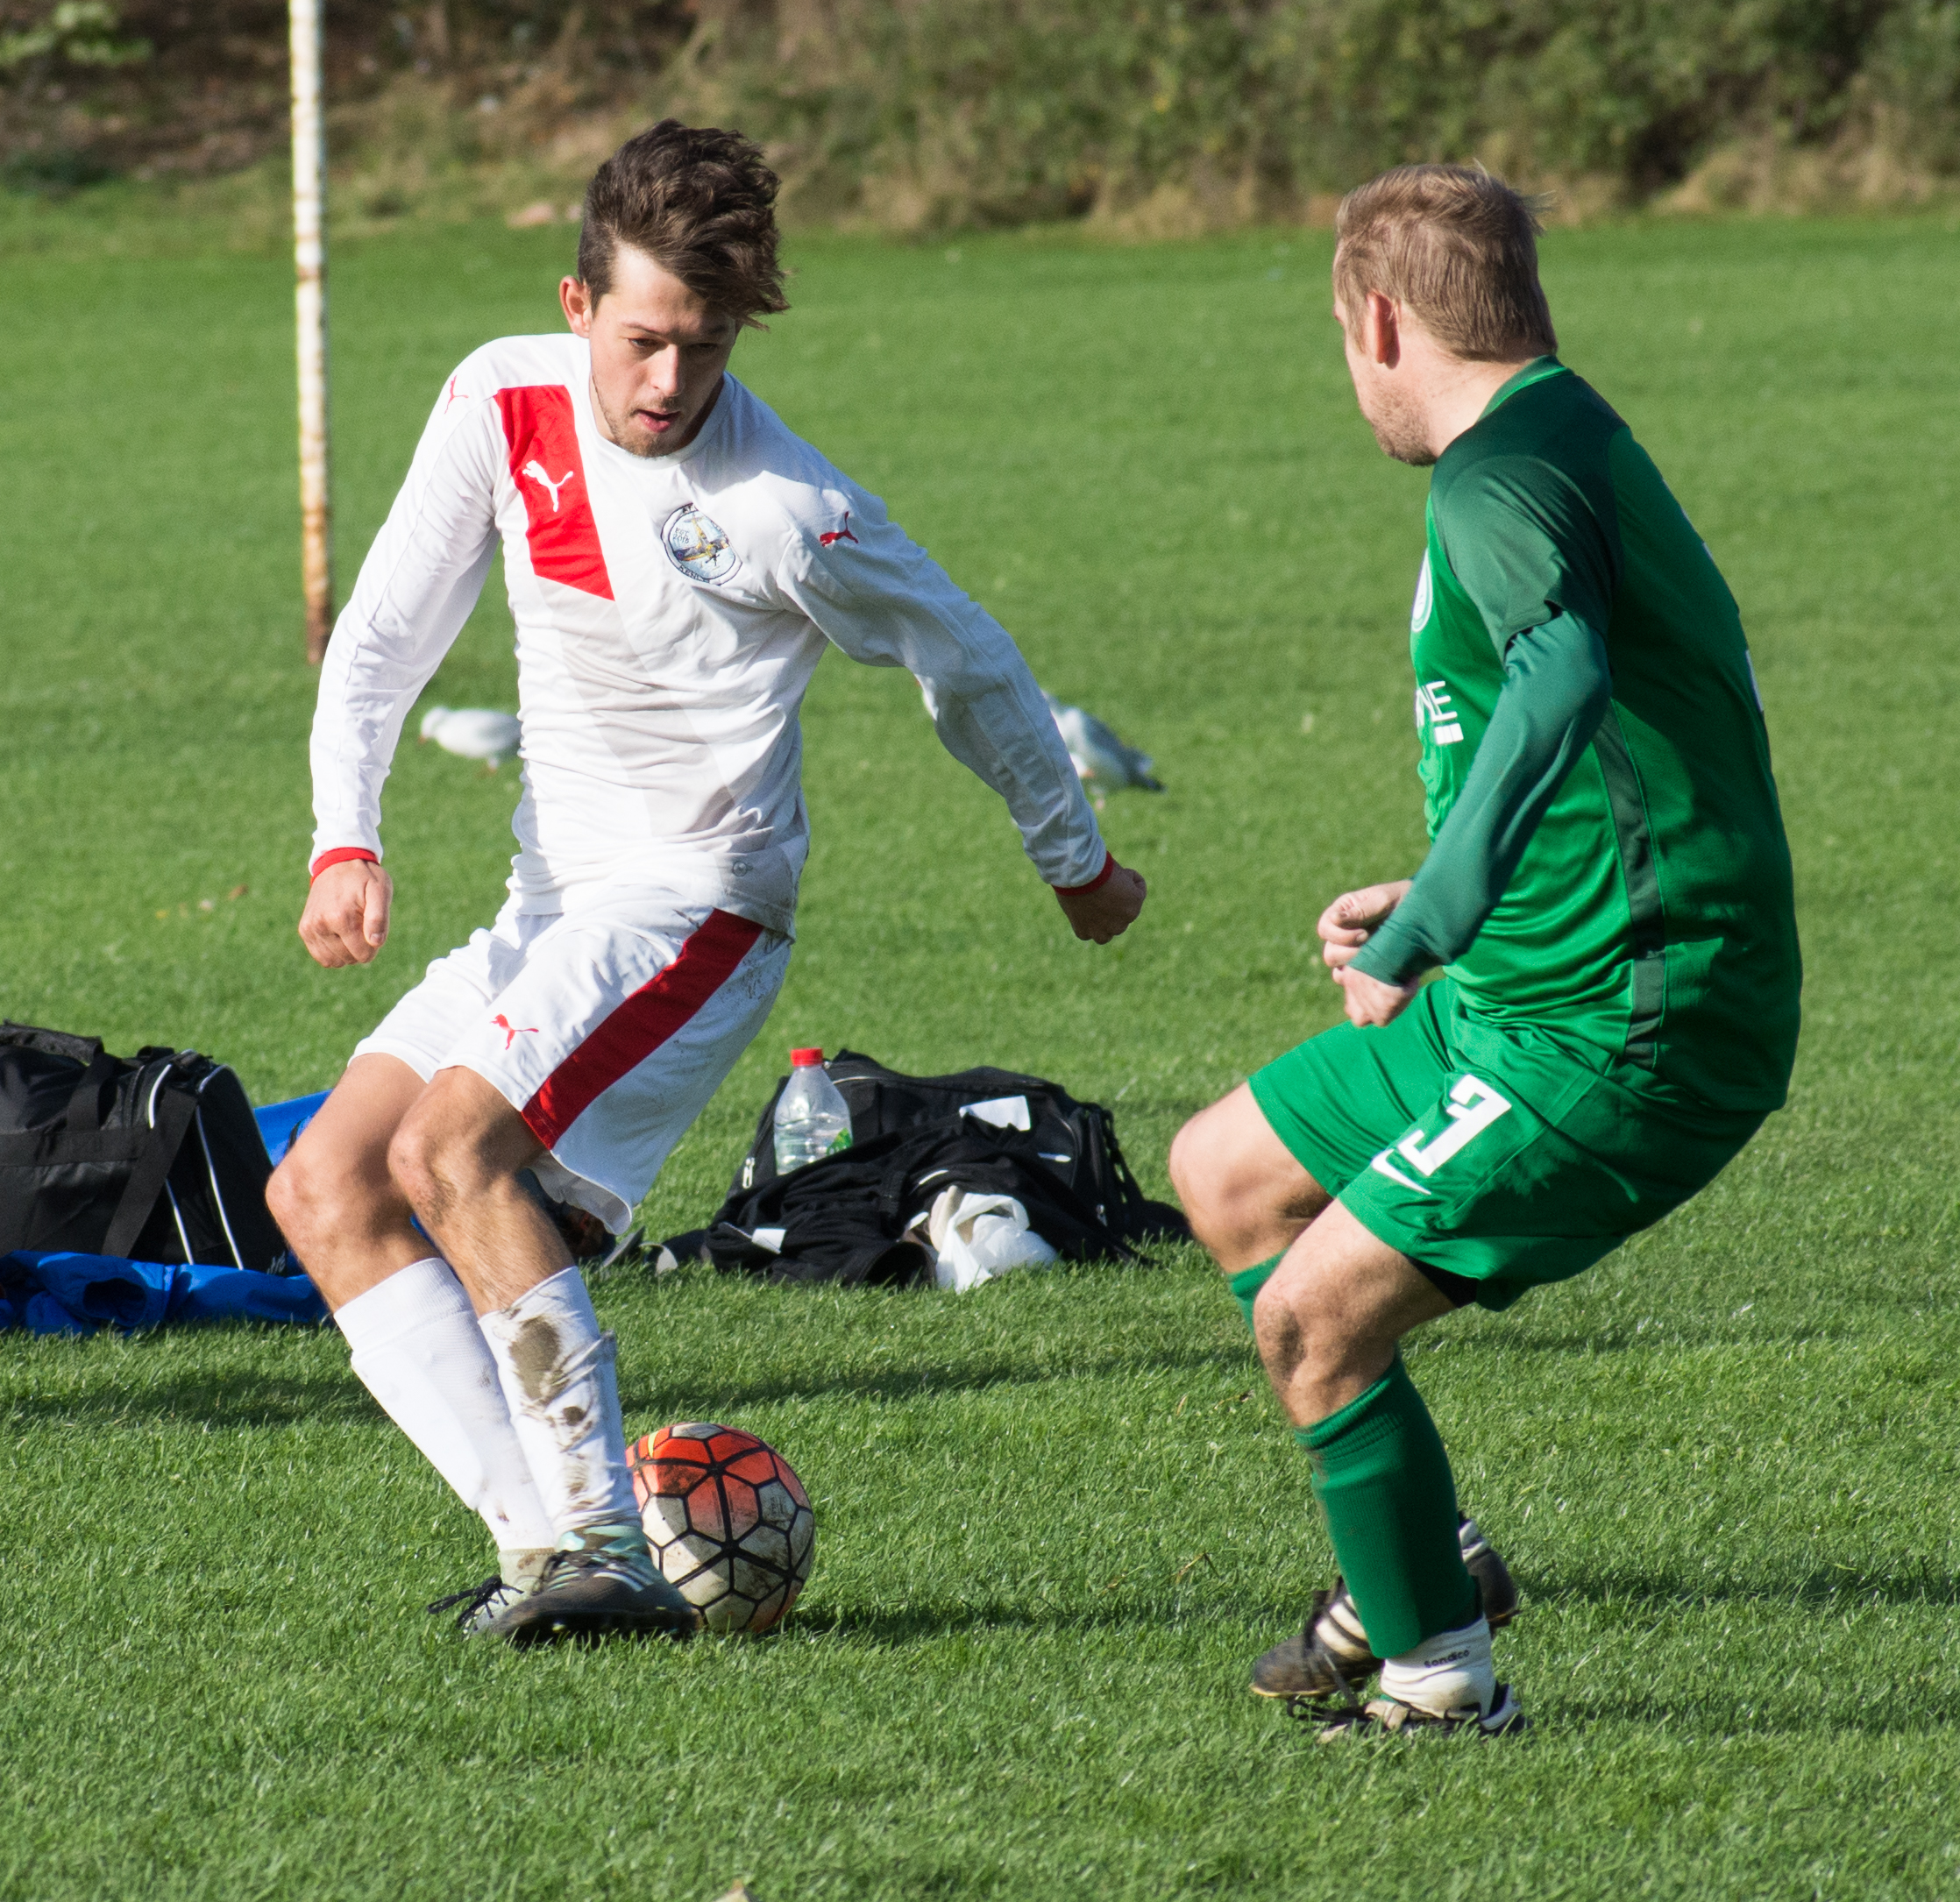 FC Sporting vs Brighton Lights 21.10.17 16